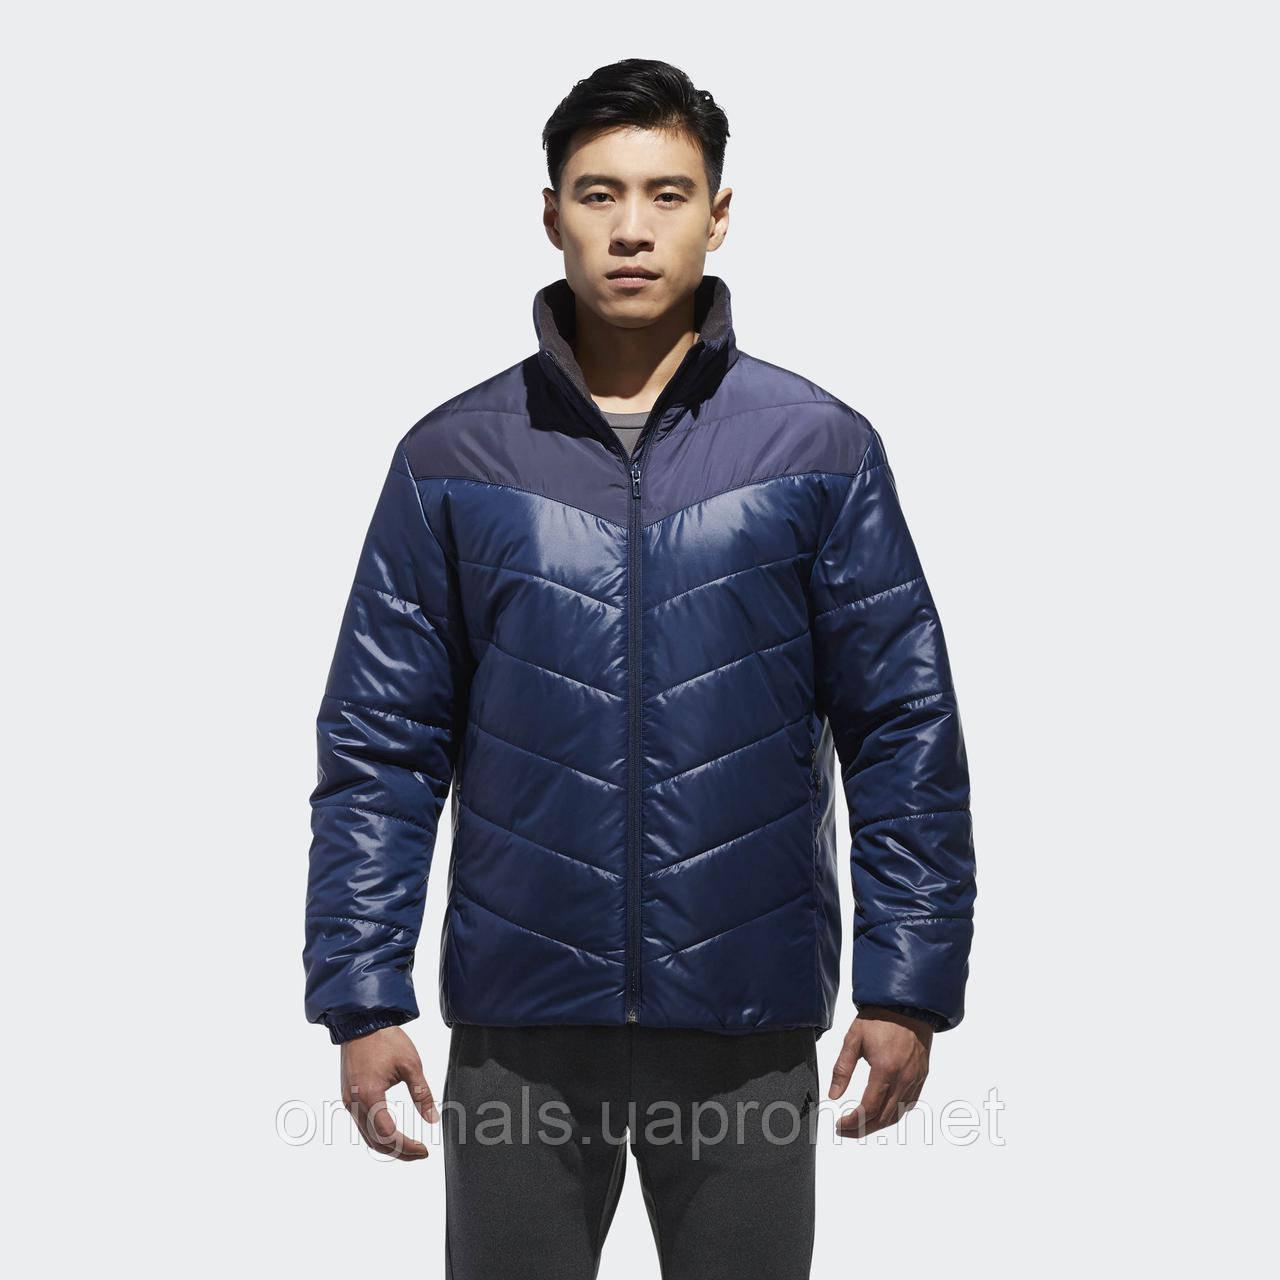 Куртка Adidas Cytins Padded Jacket BQ4244